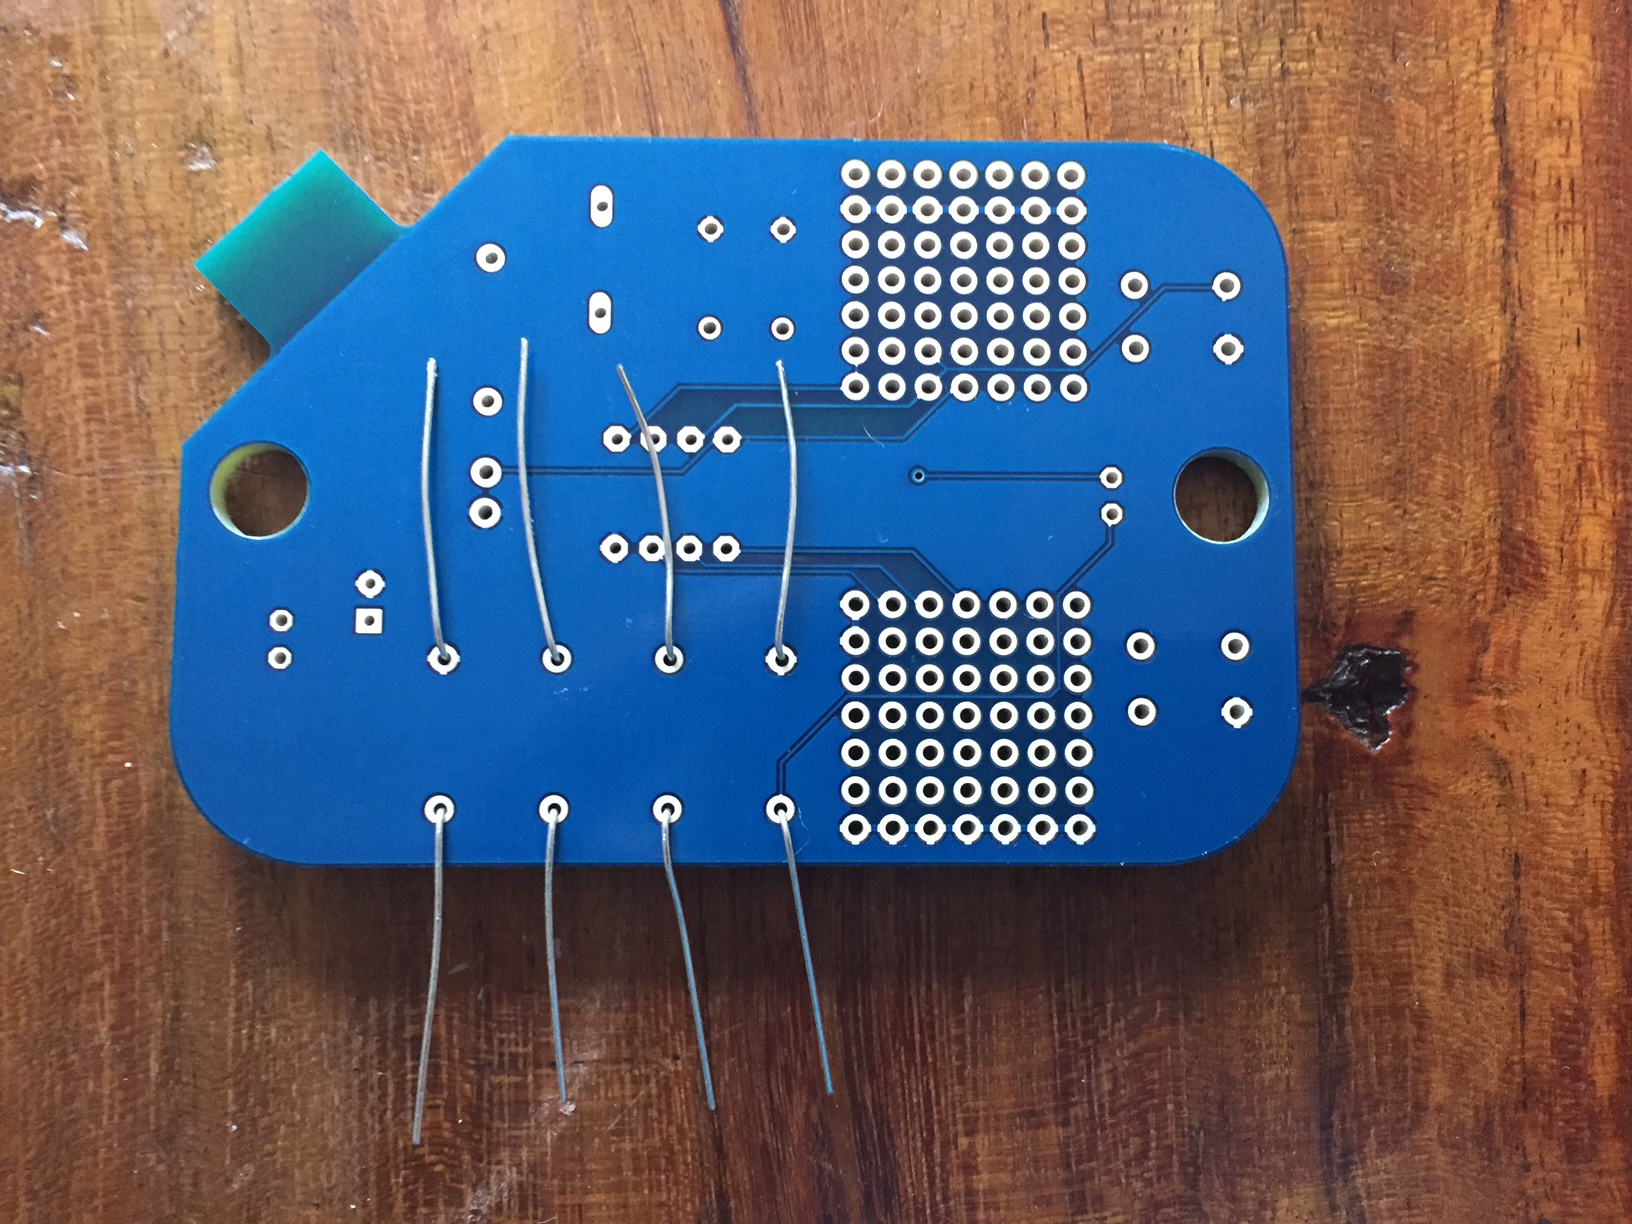 Resistor pins through board holes